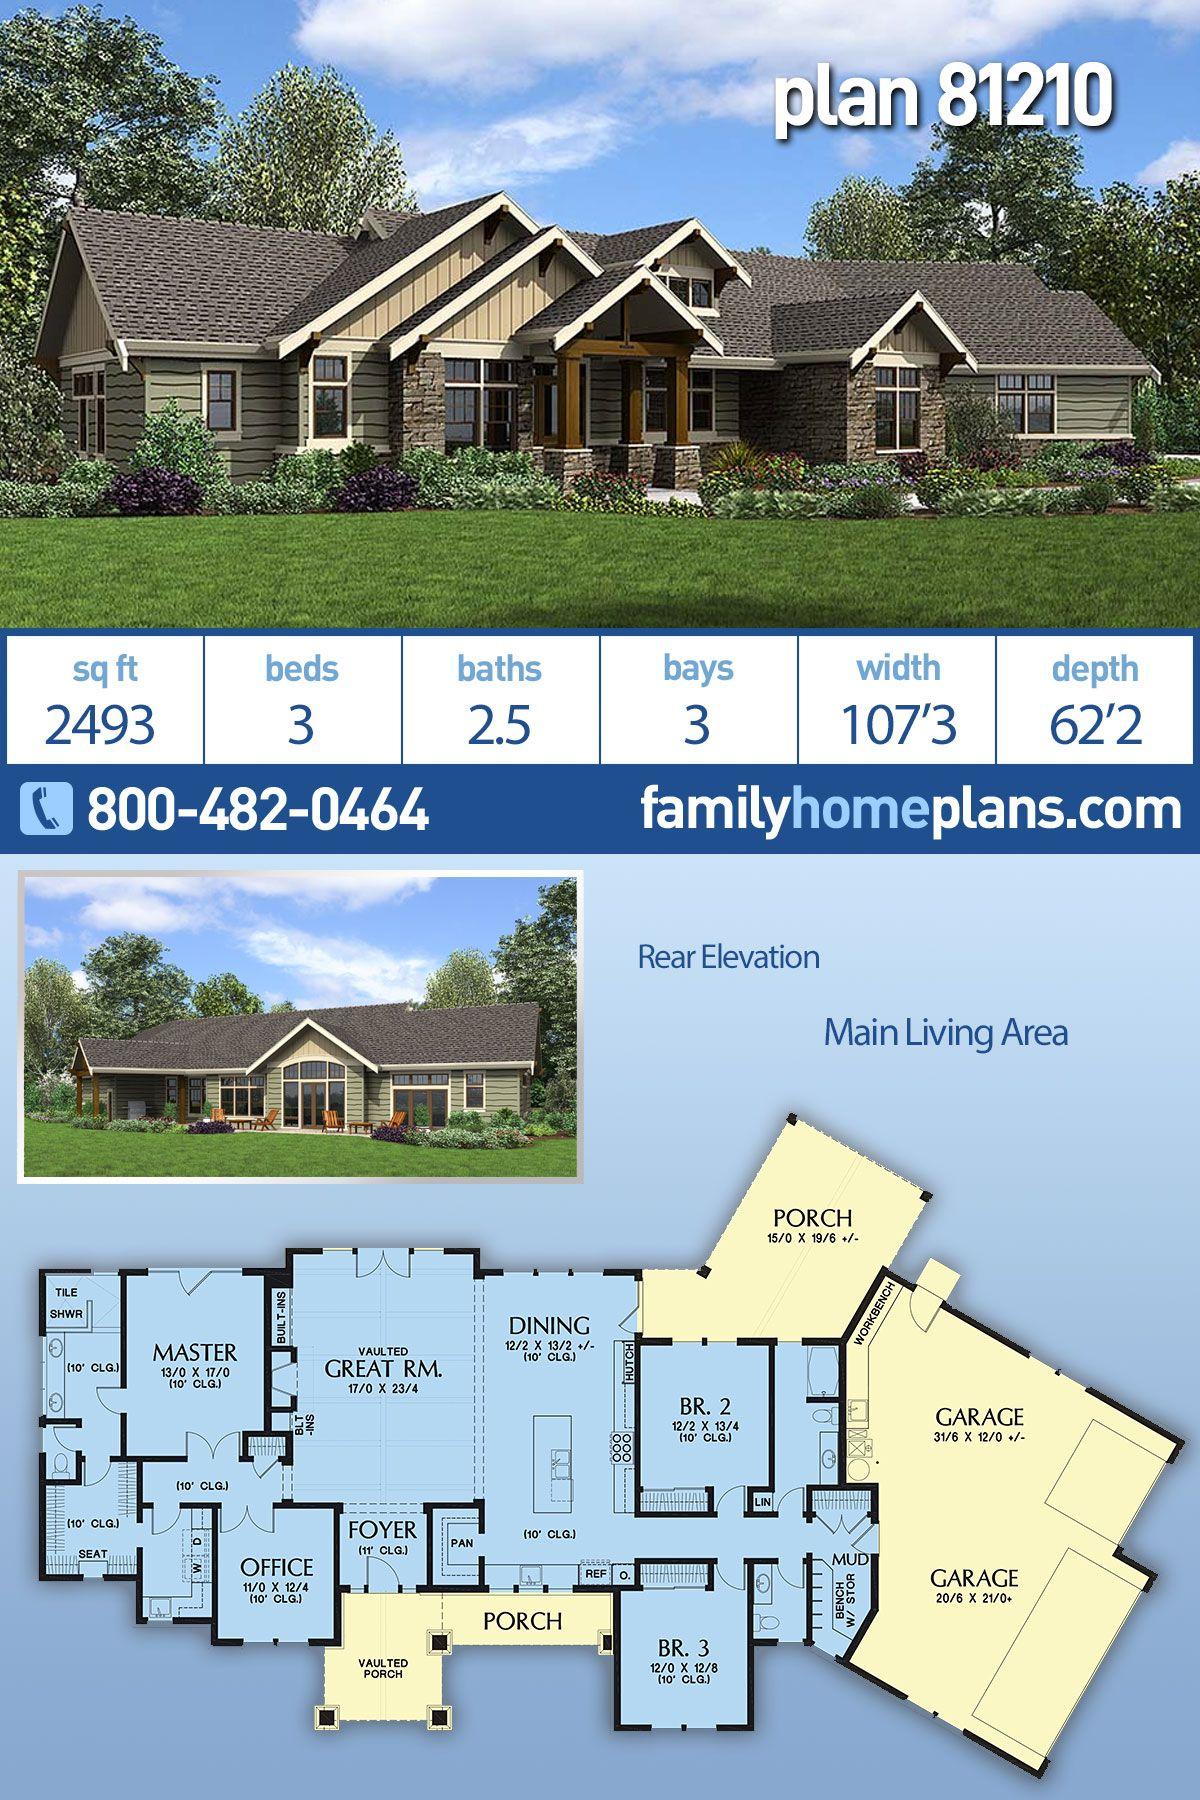 Craftsman Style Ranch Homes : craftsman, style, ranch, homes, Ranch, Style, House, 81210, Bath,, Garage, Homes,, Plans,, Craftsman